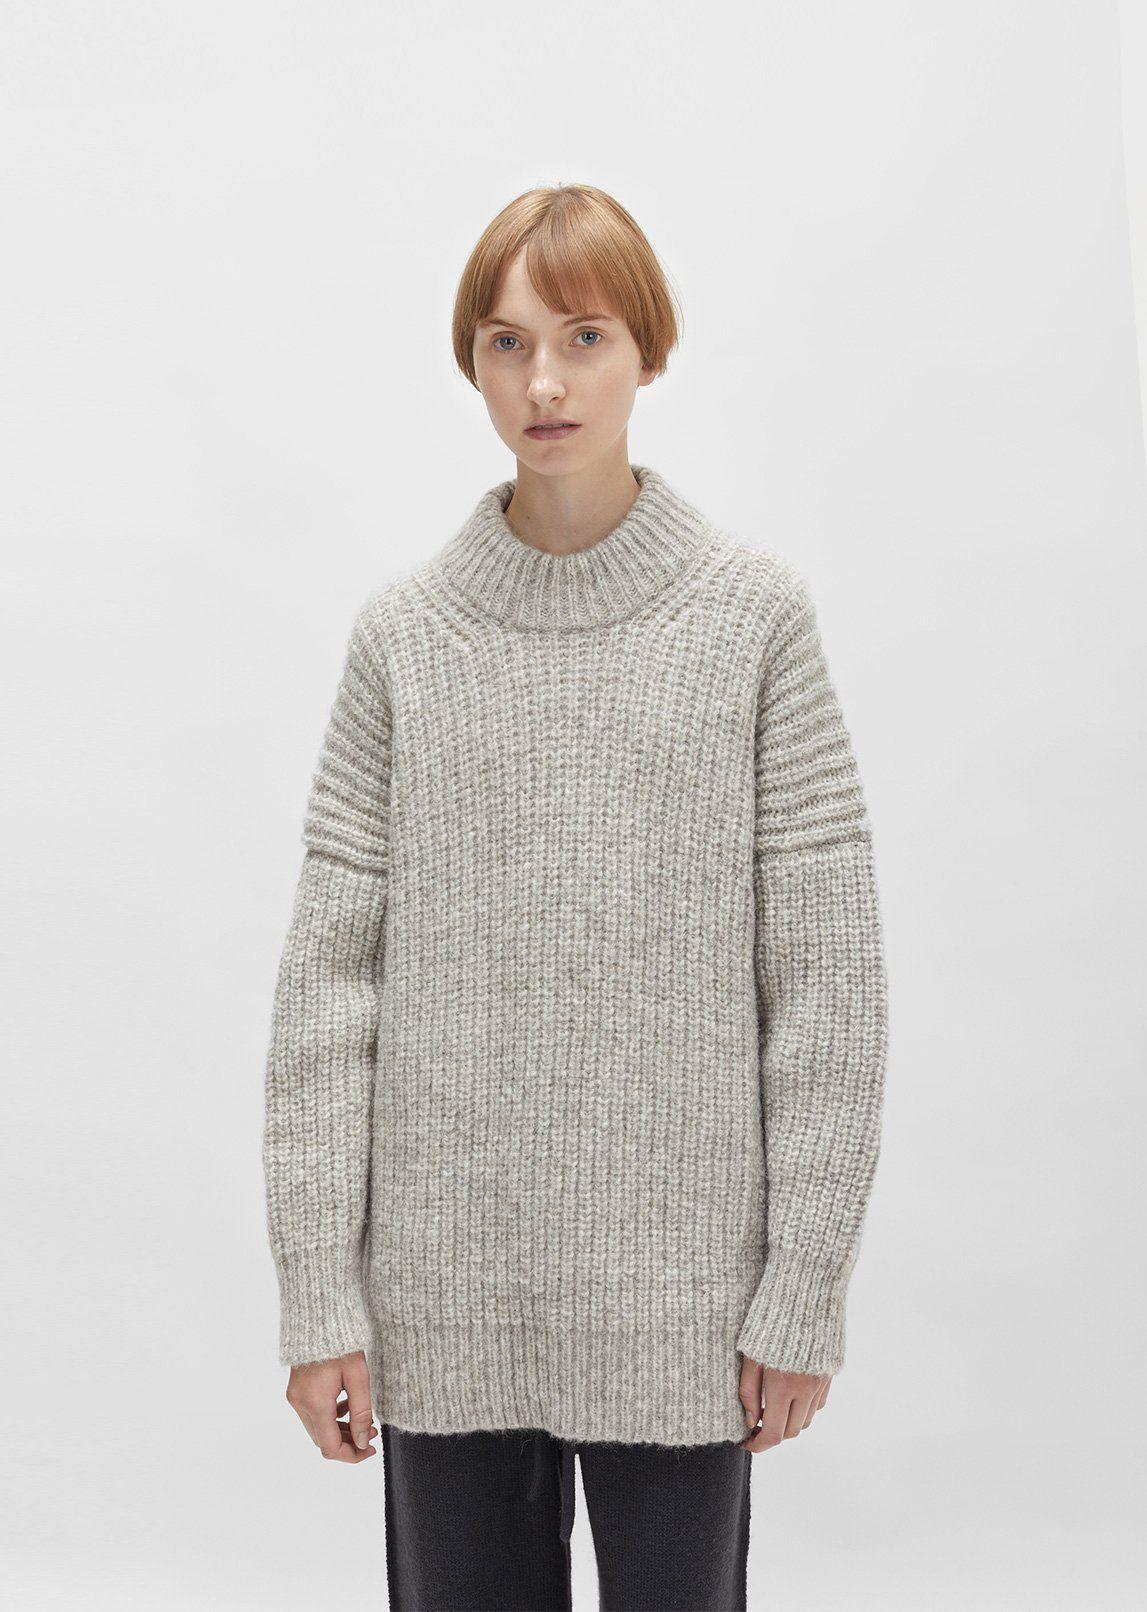 c2ab0846c Dark grey chunky knit turtleneck sweater made from ultra-soft fine ...